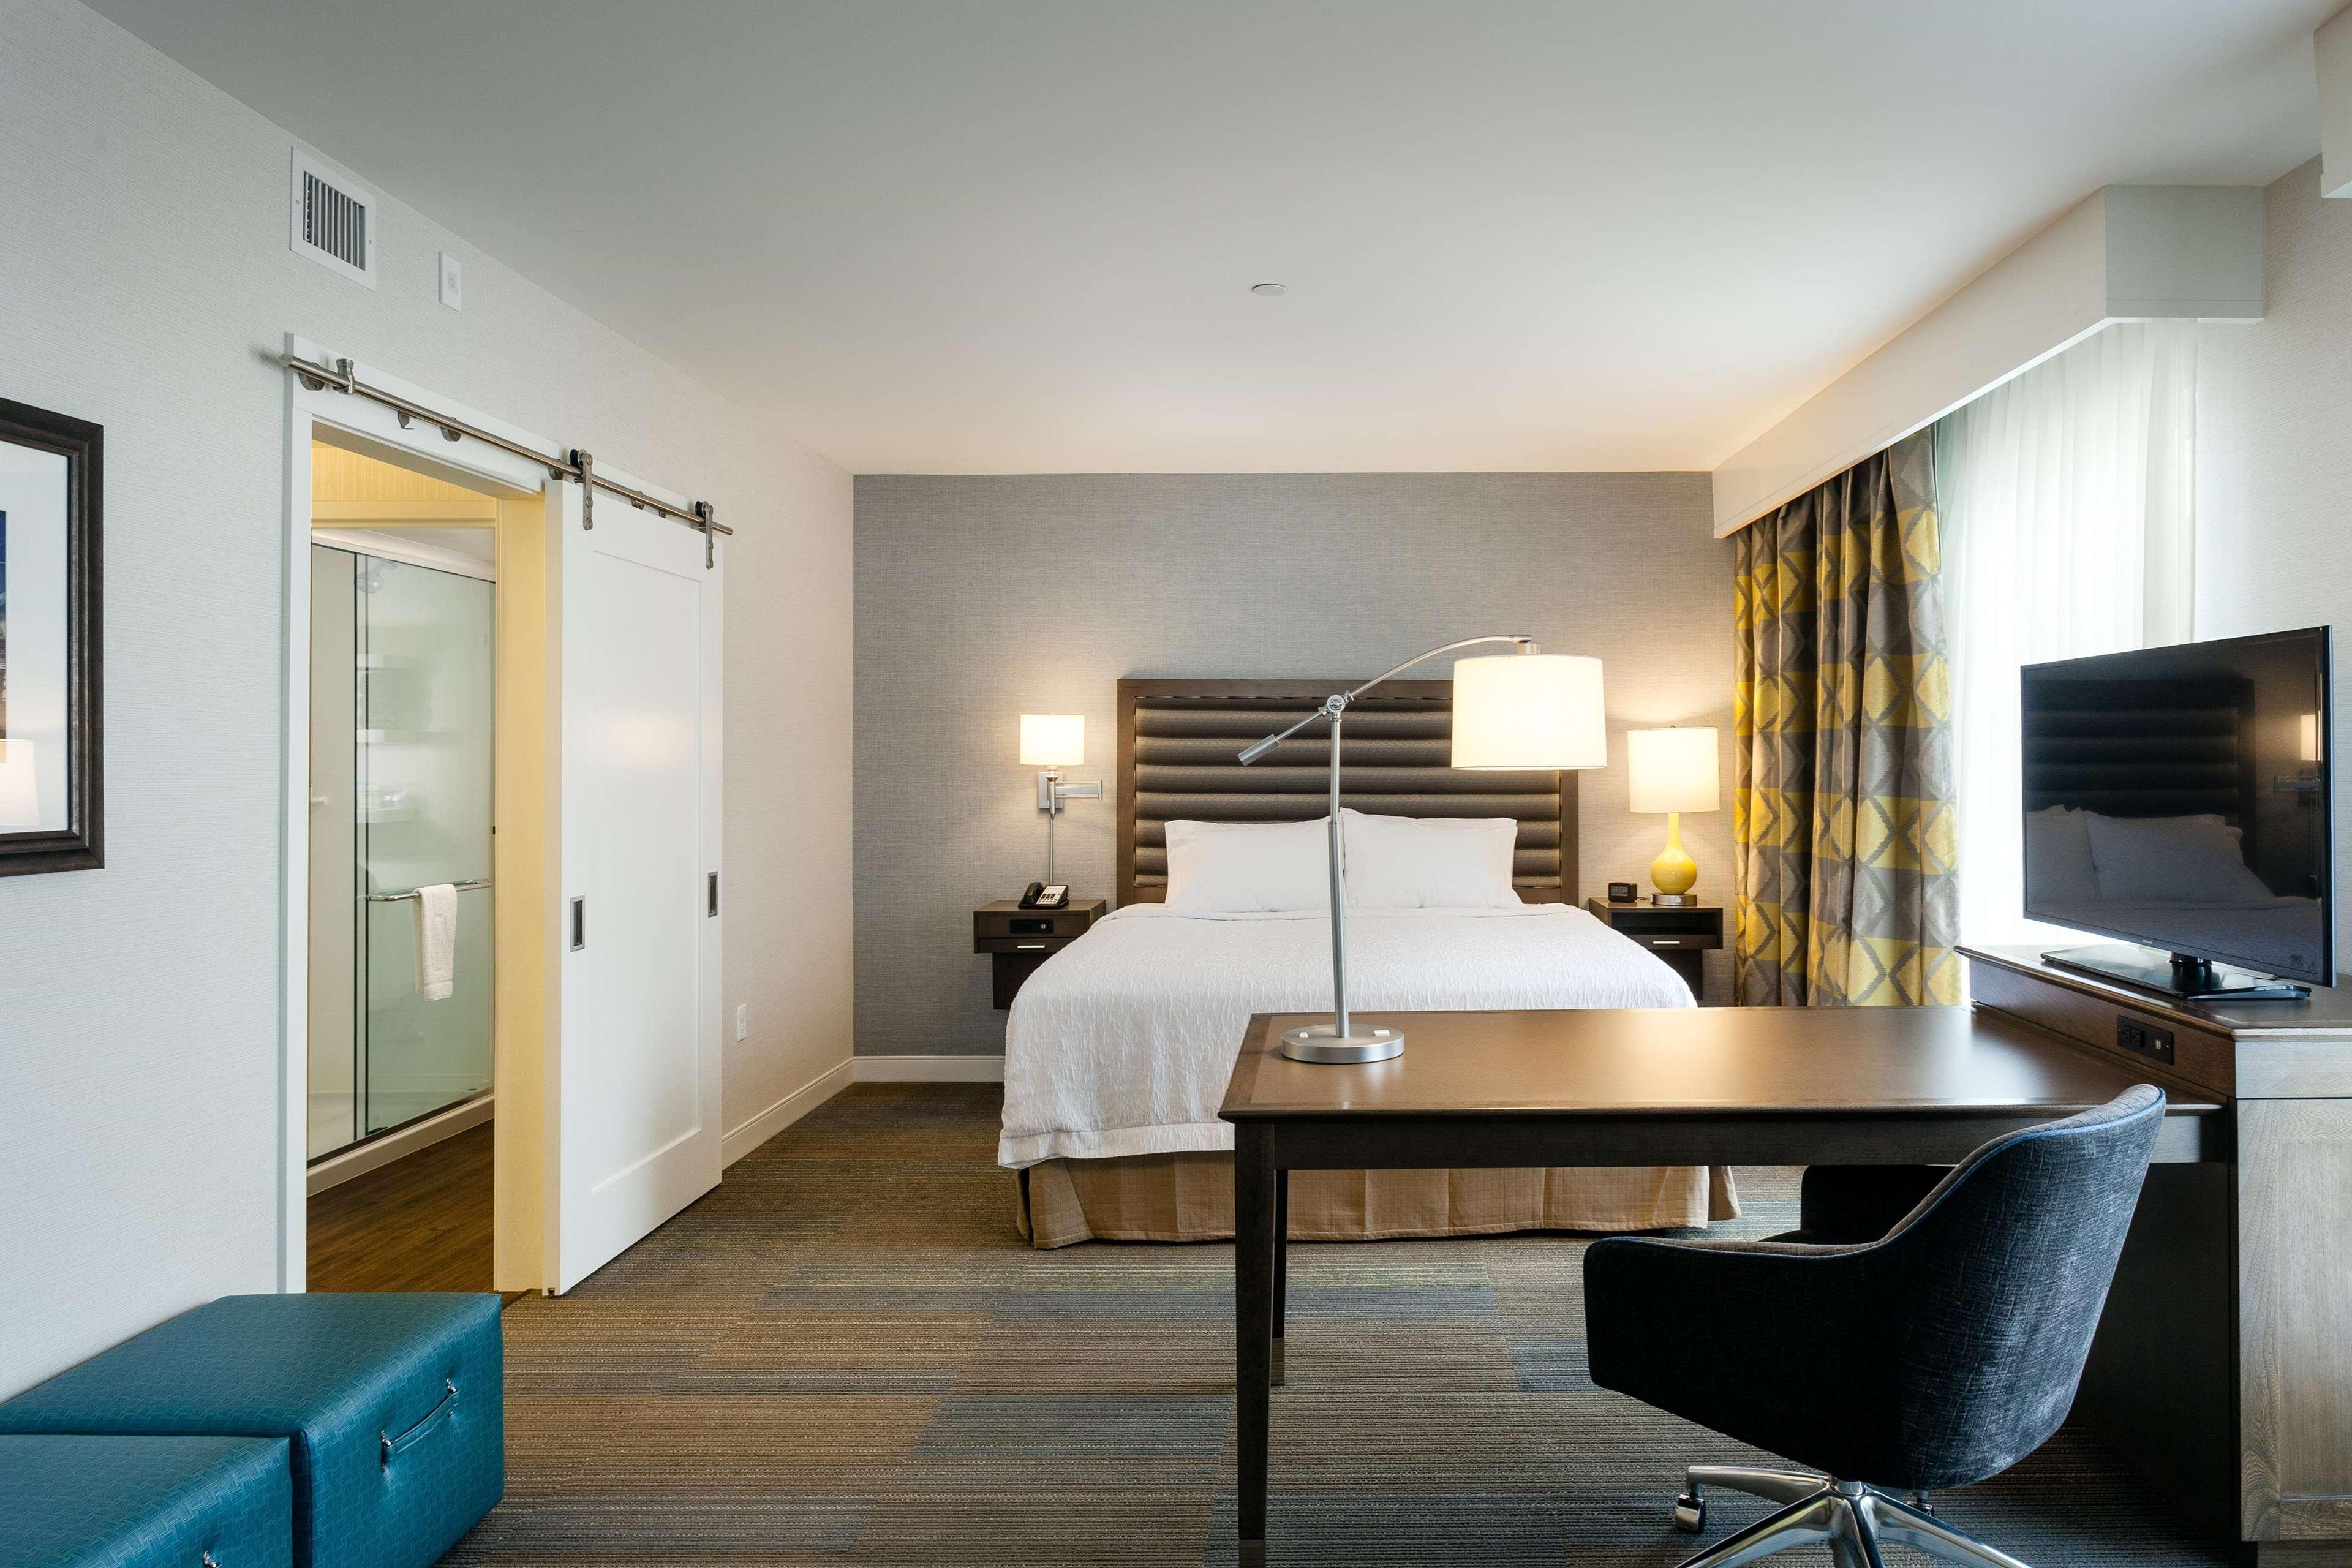 Hampton Inn & Suites by Hilton Seattle/Northgate image 22